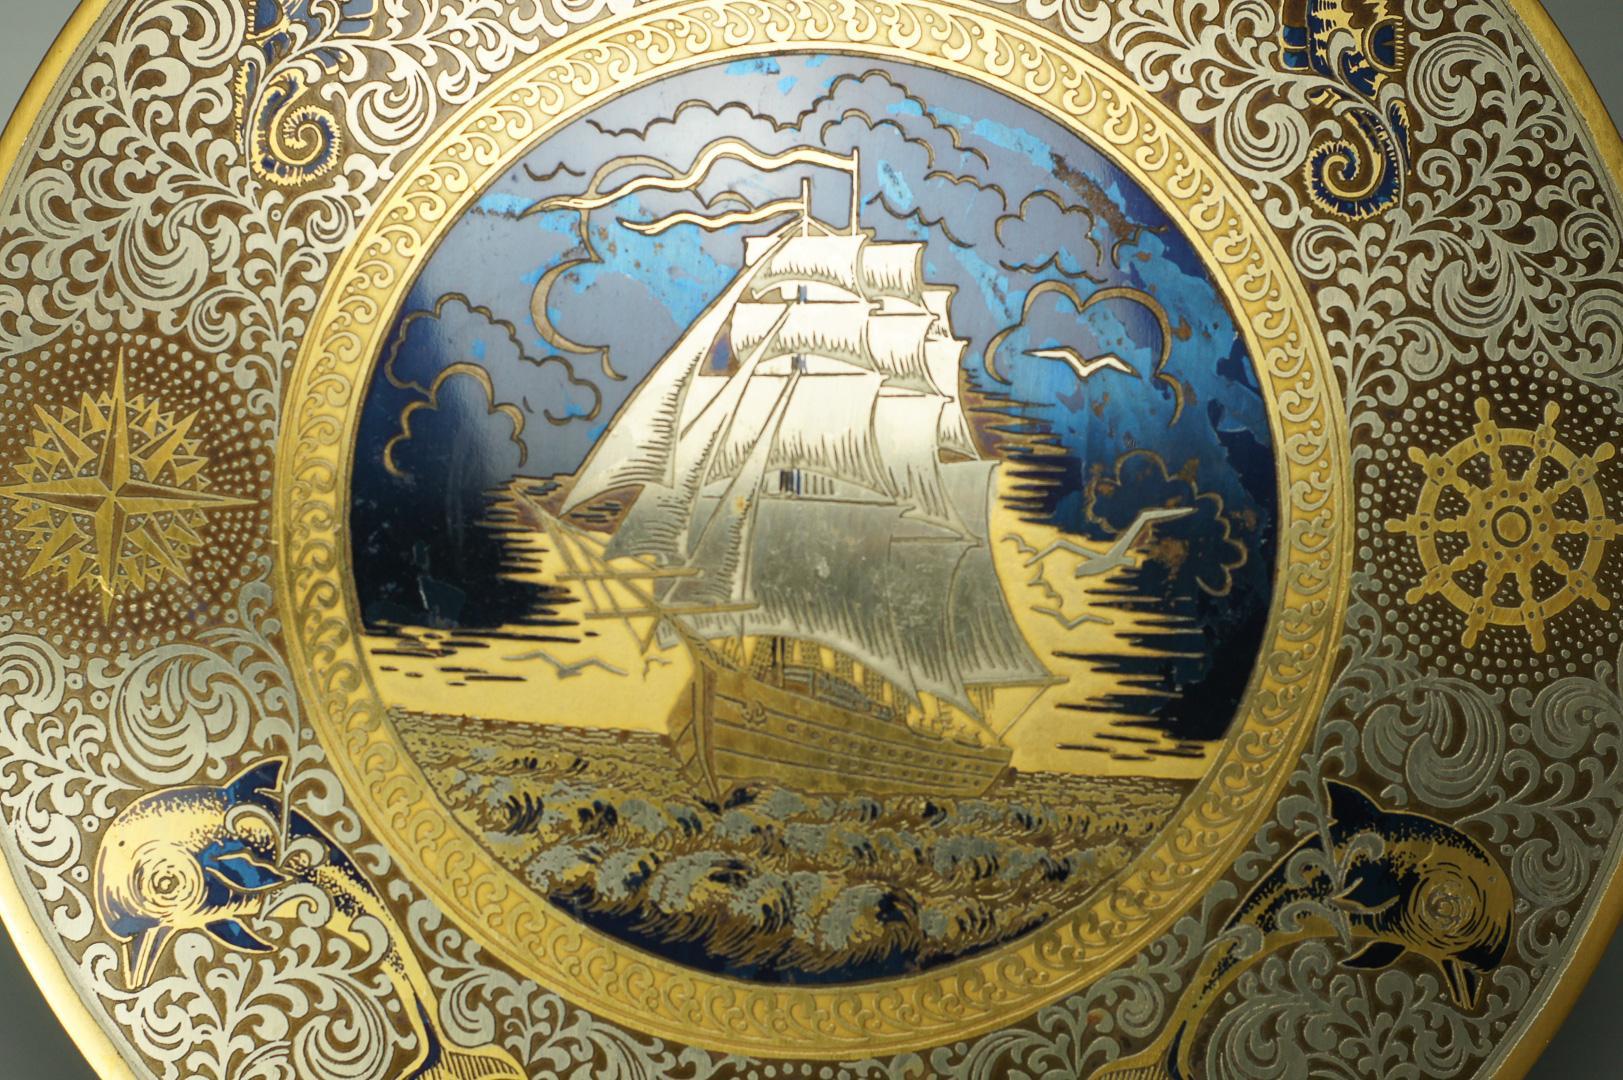 Парусник гравюра на стали златоуст